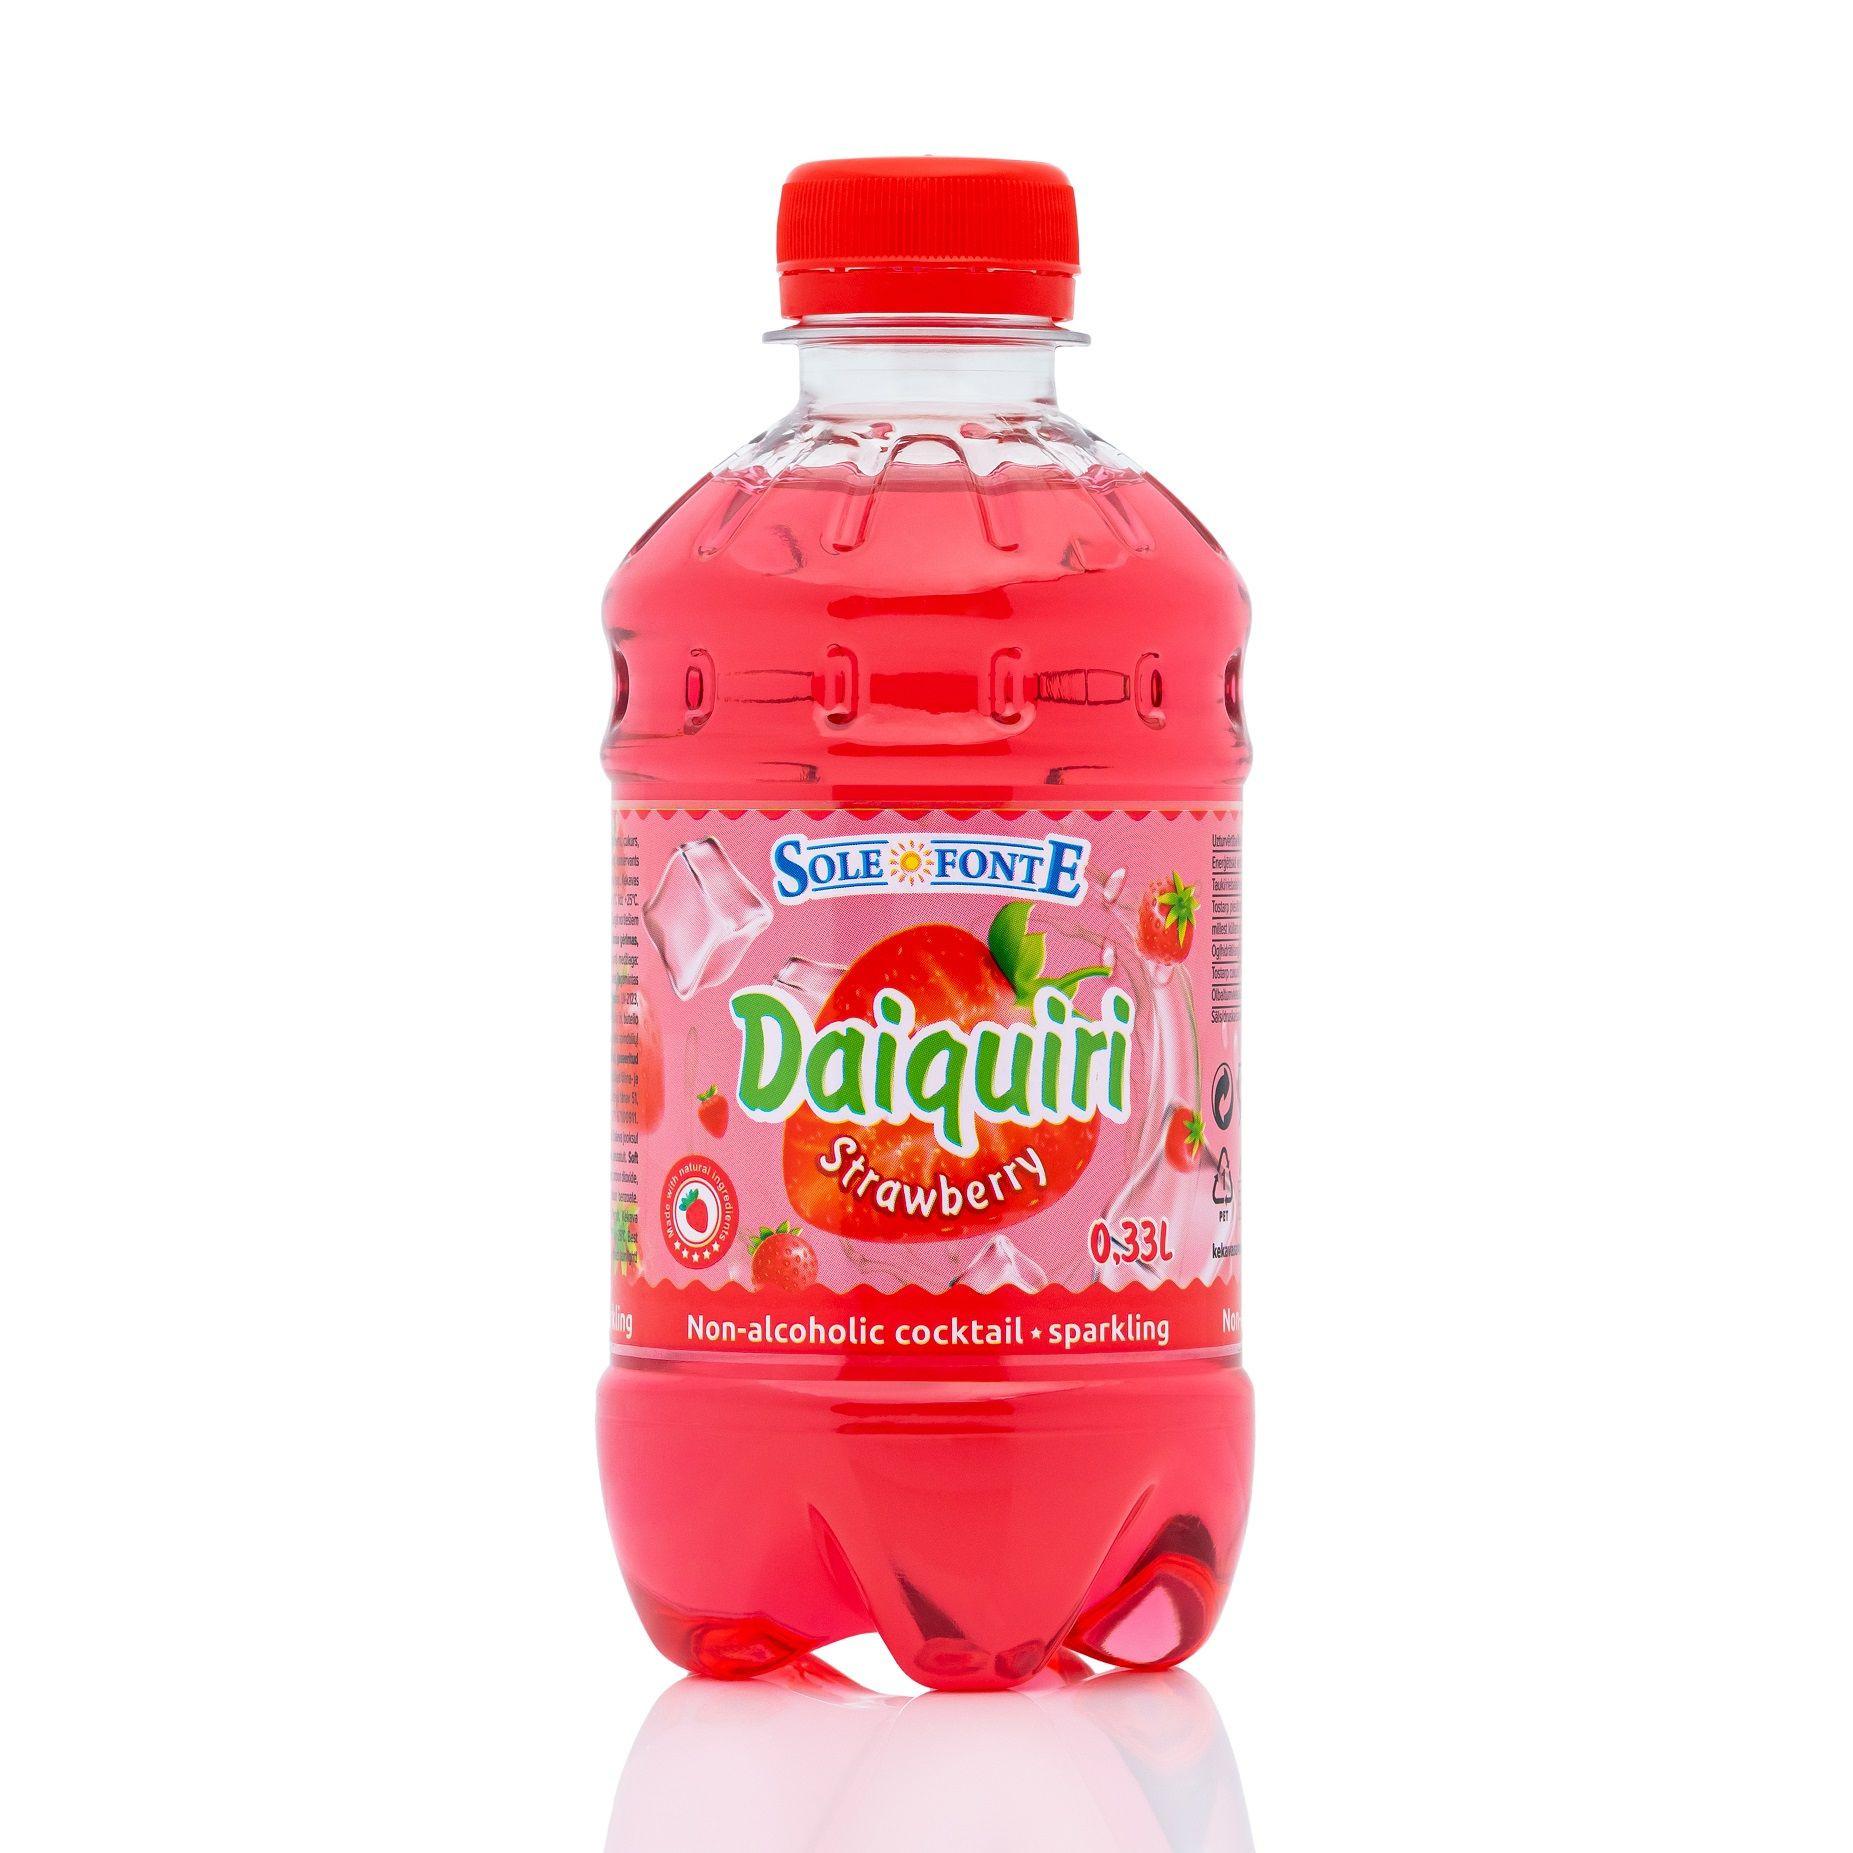 SOFT DRINK Strawberry Daiquiri 0.33L sparkling PET